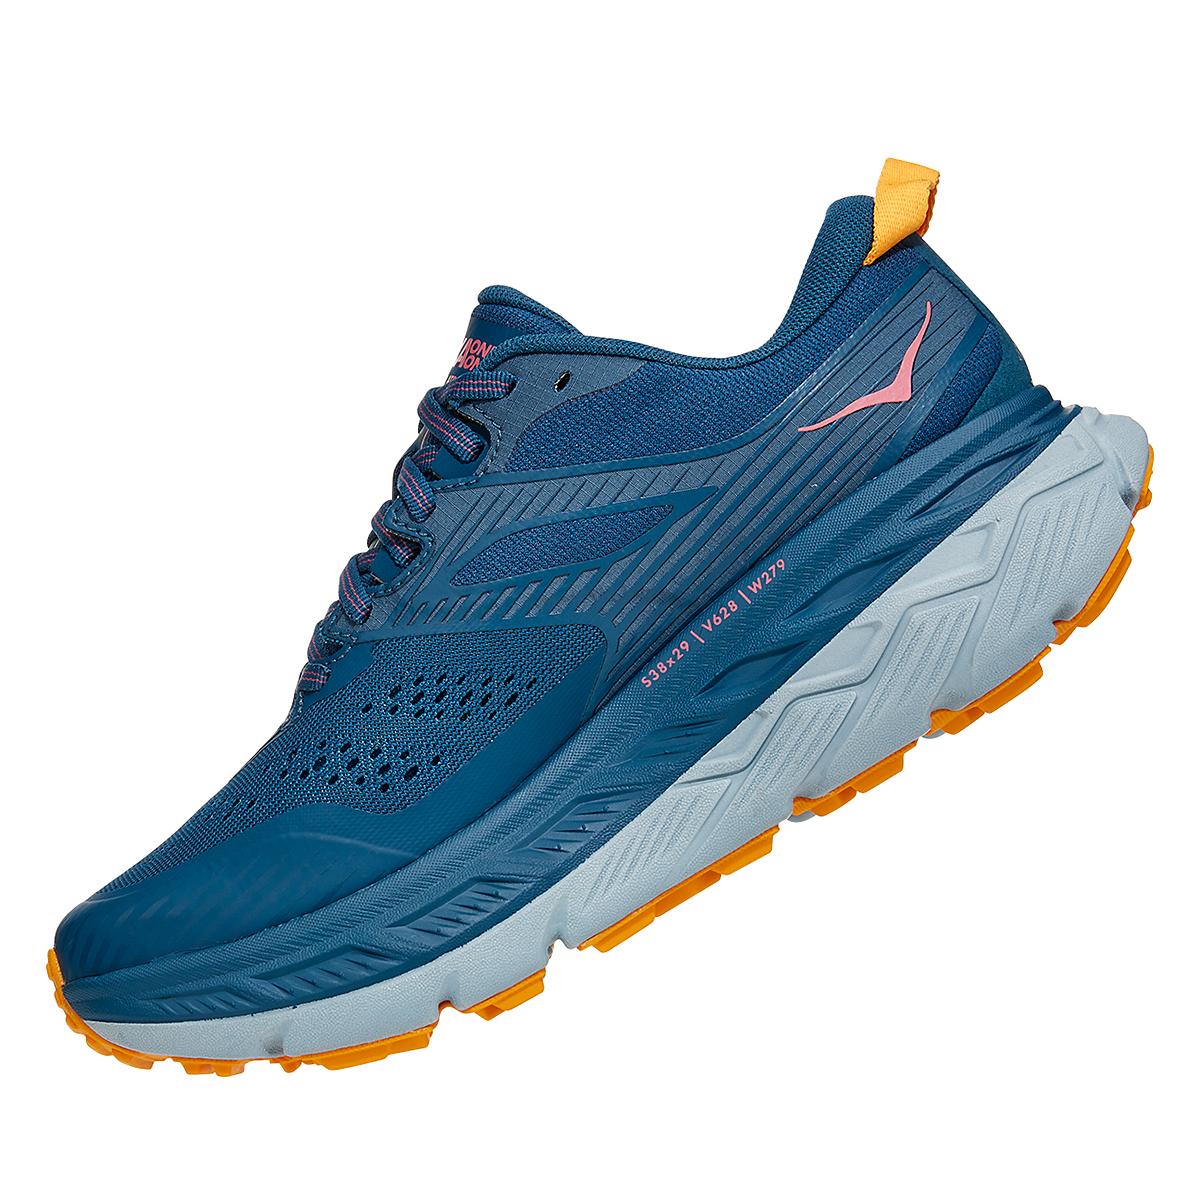 Women's Hoka One One Stinson ATR 6 Trail Running Shoe - Color: Moroccan Blue/Saffron - Size: 5 - Width: Regular, Moroccan Blue/Saffron, large, image 4